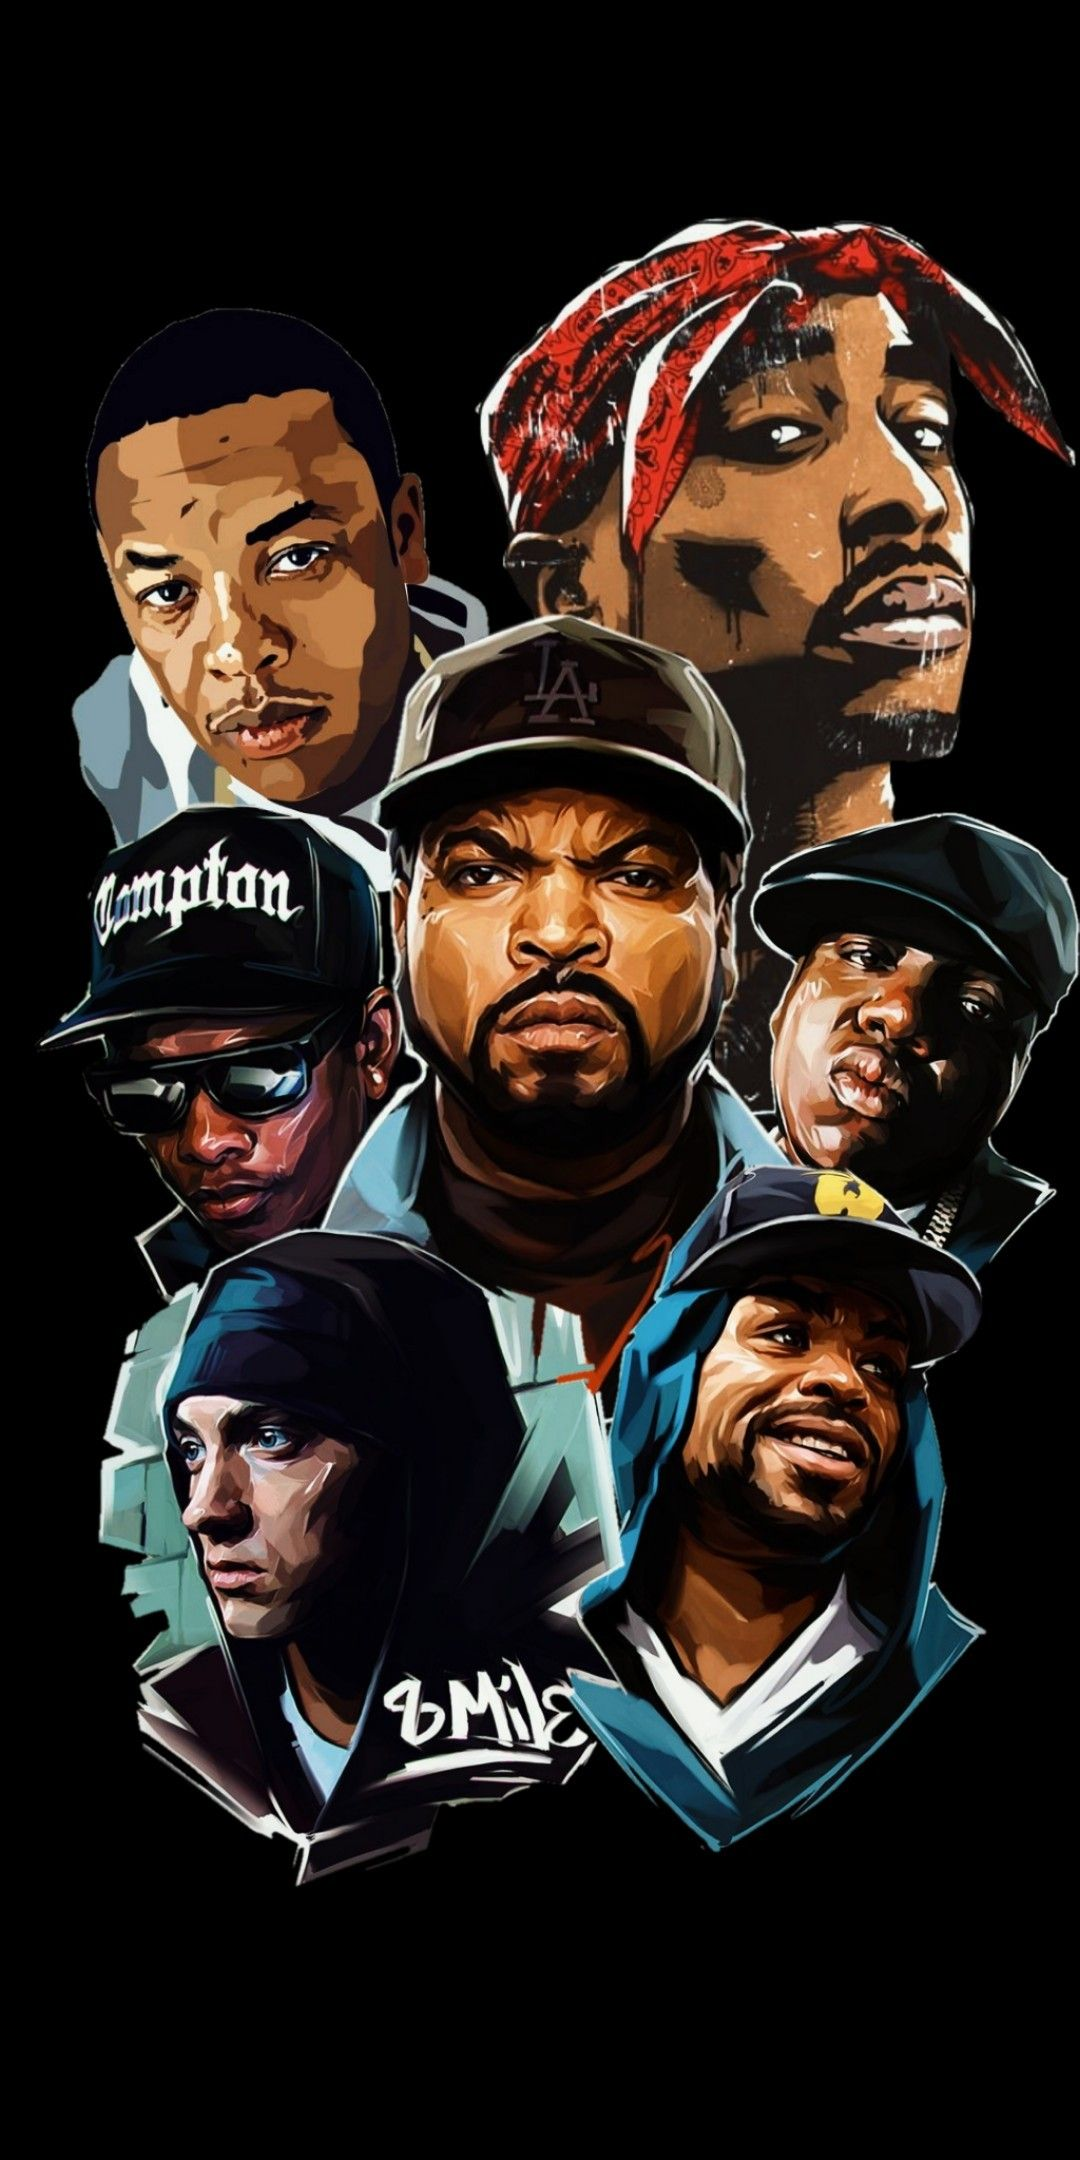 e6130ef38cdad94f78e944ff5fd90cd9 - Was ist unter Rap zu verstehen?